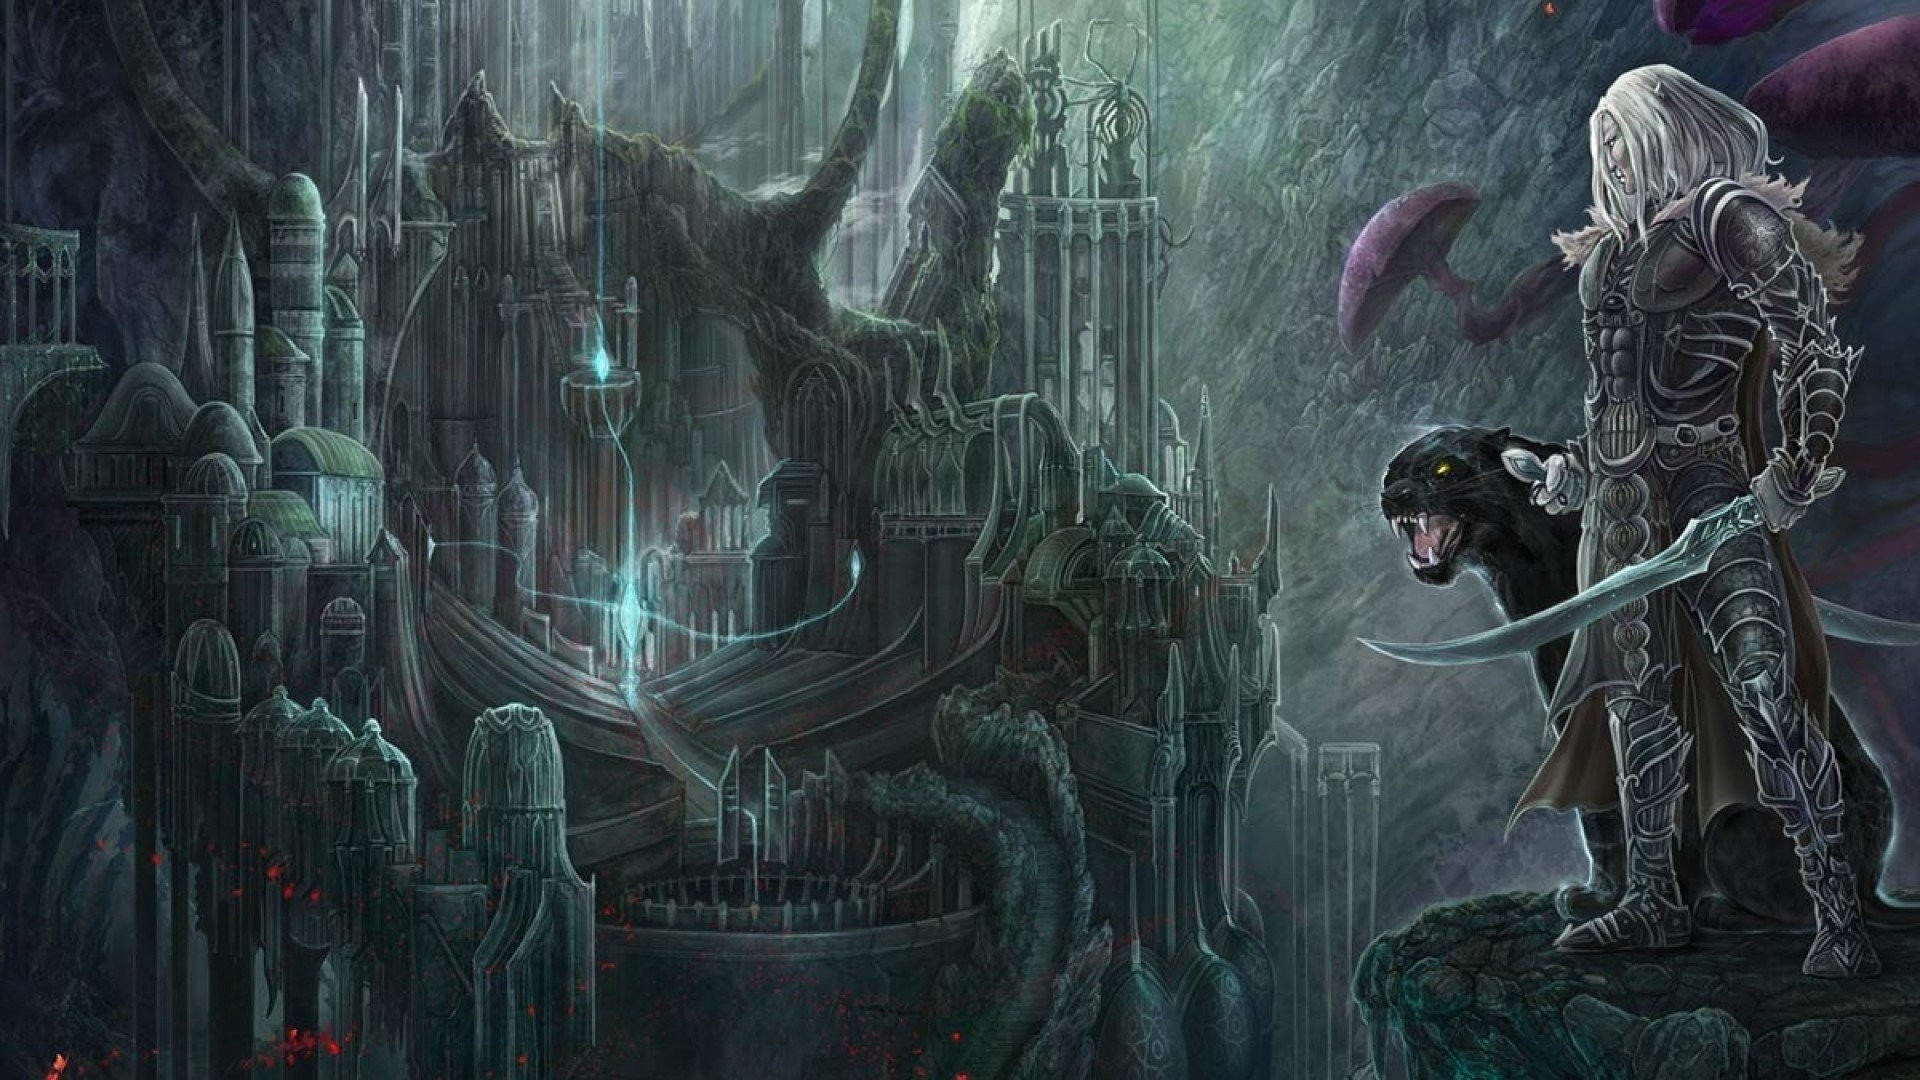 illustration to the book saber robert salvatore robert salvatore dark elf drizzt  drizzt do'urden